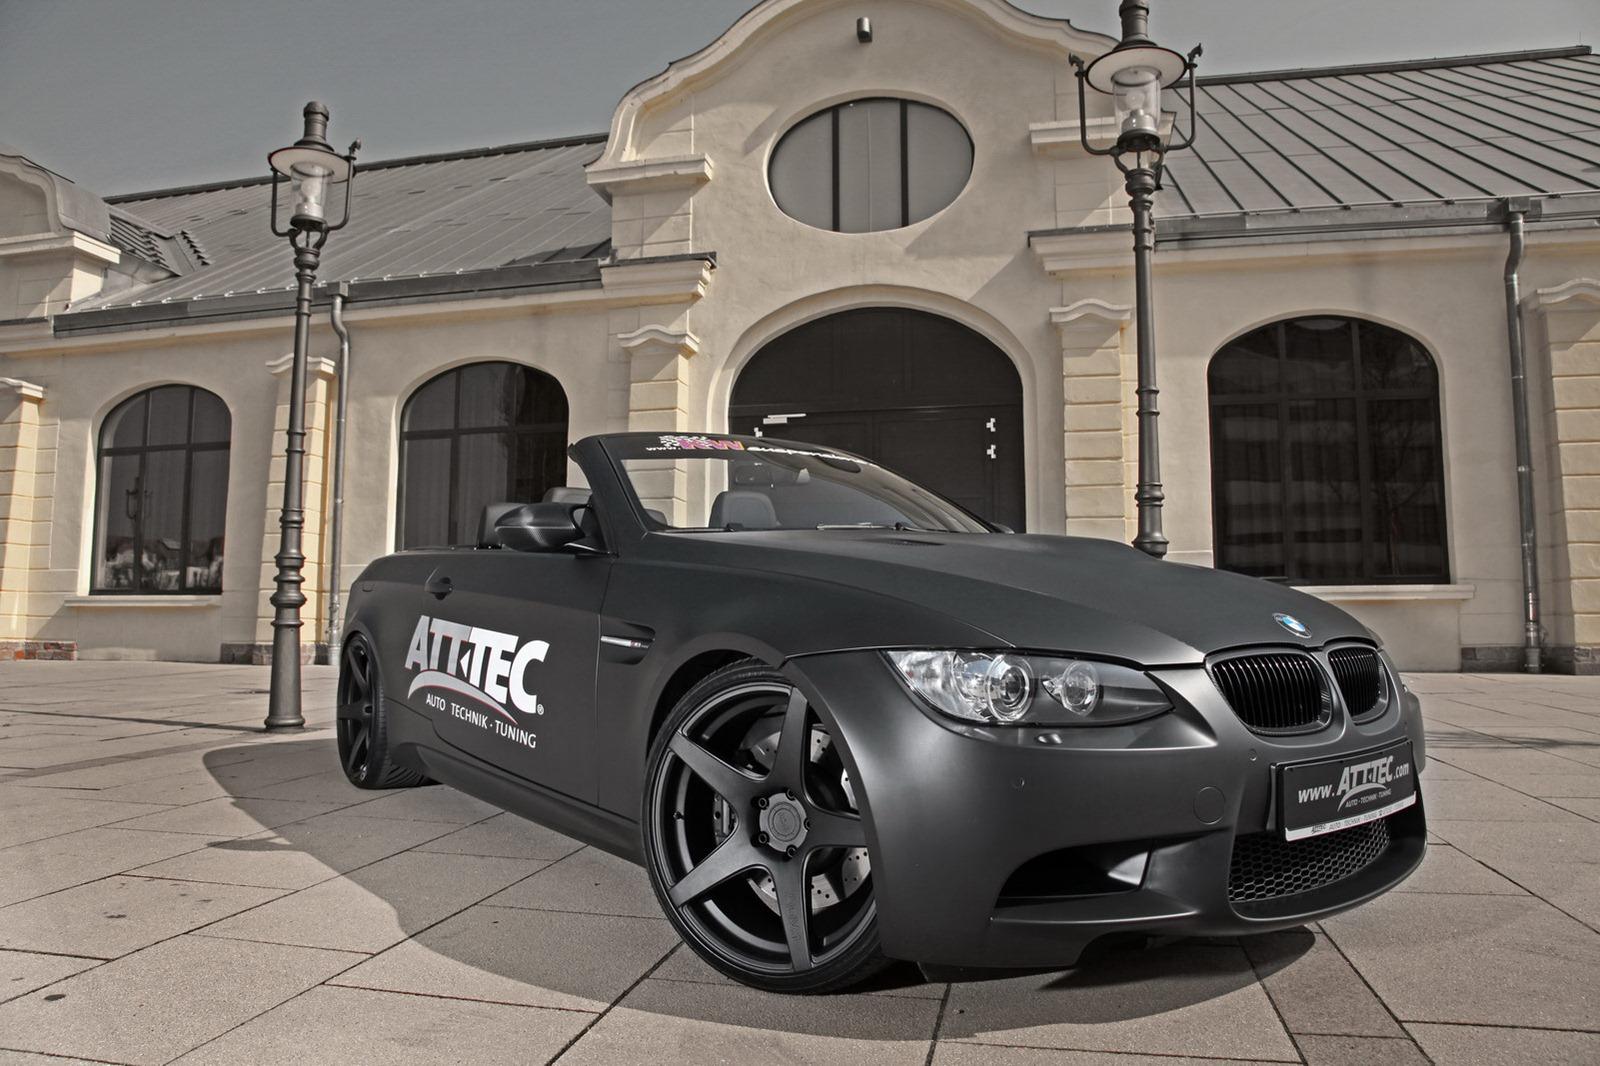 BMW M3 Convertible by ATT-TEC